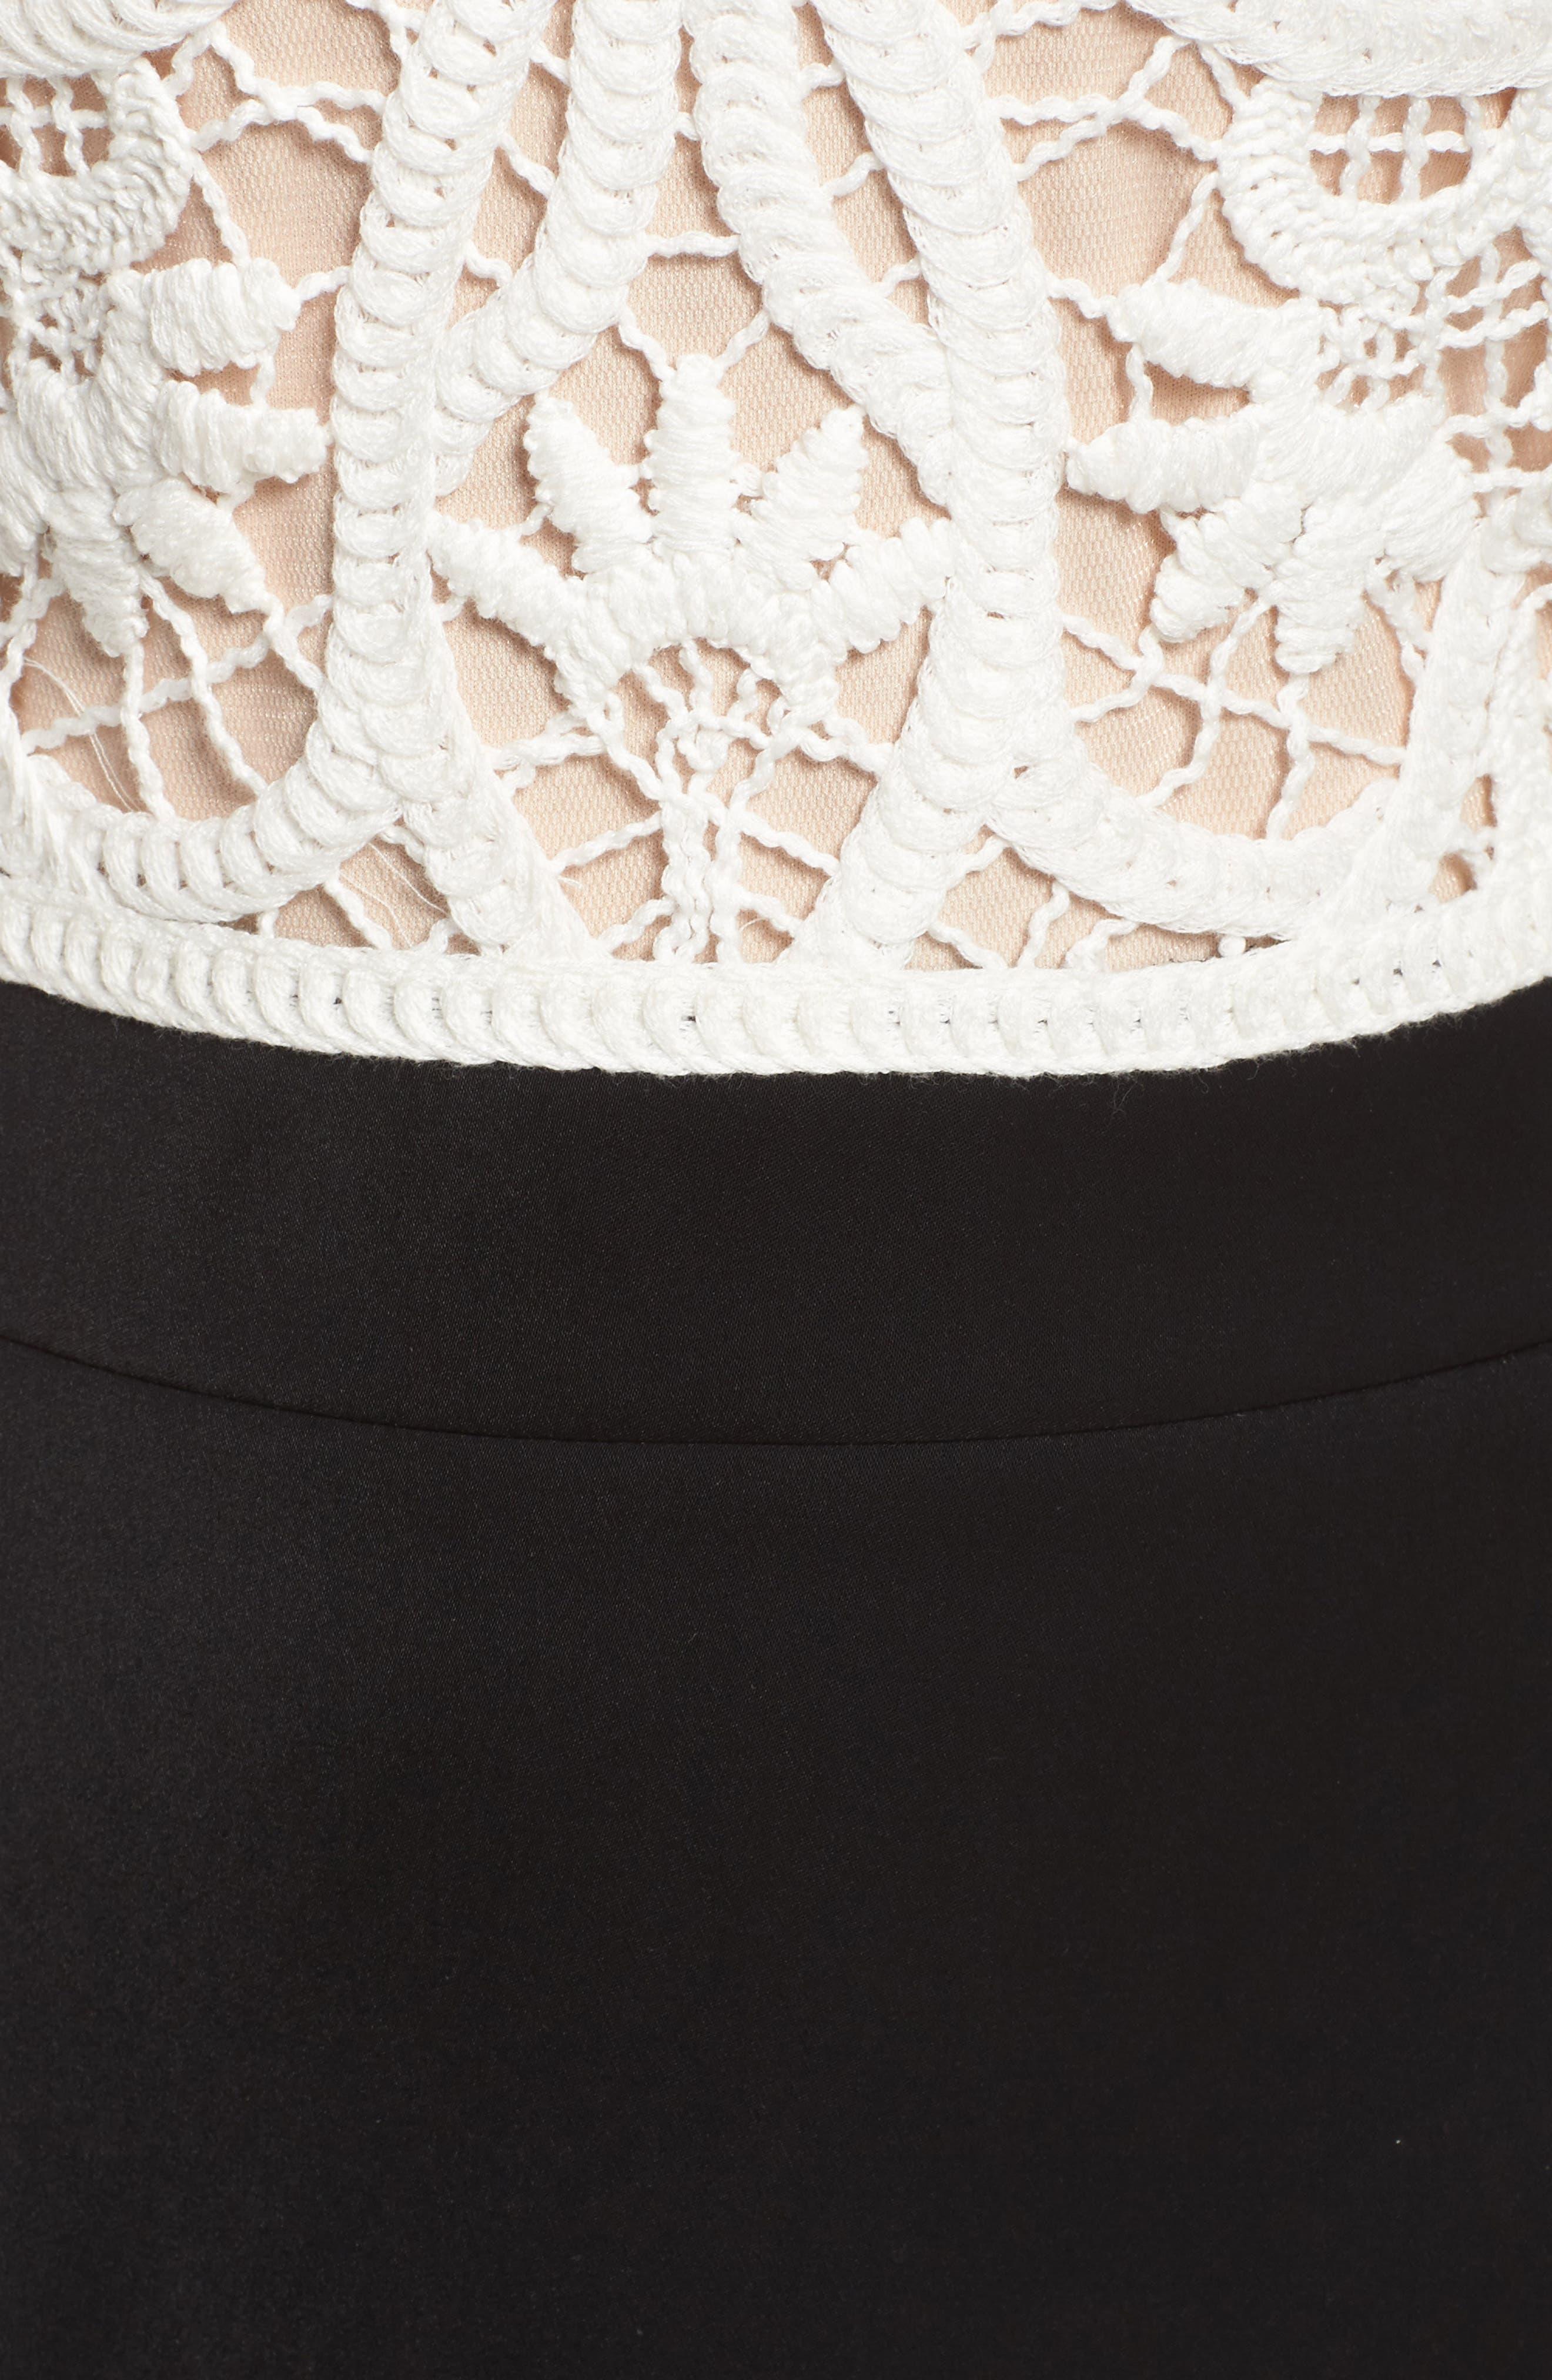 Crochet Lace & Crepe Gown,                             Alternate thumbnail 5, color,                             Ivory/ Black